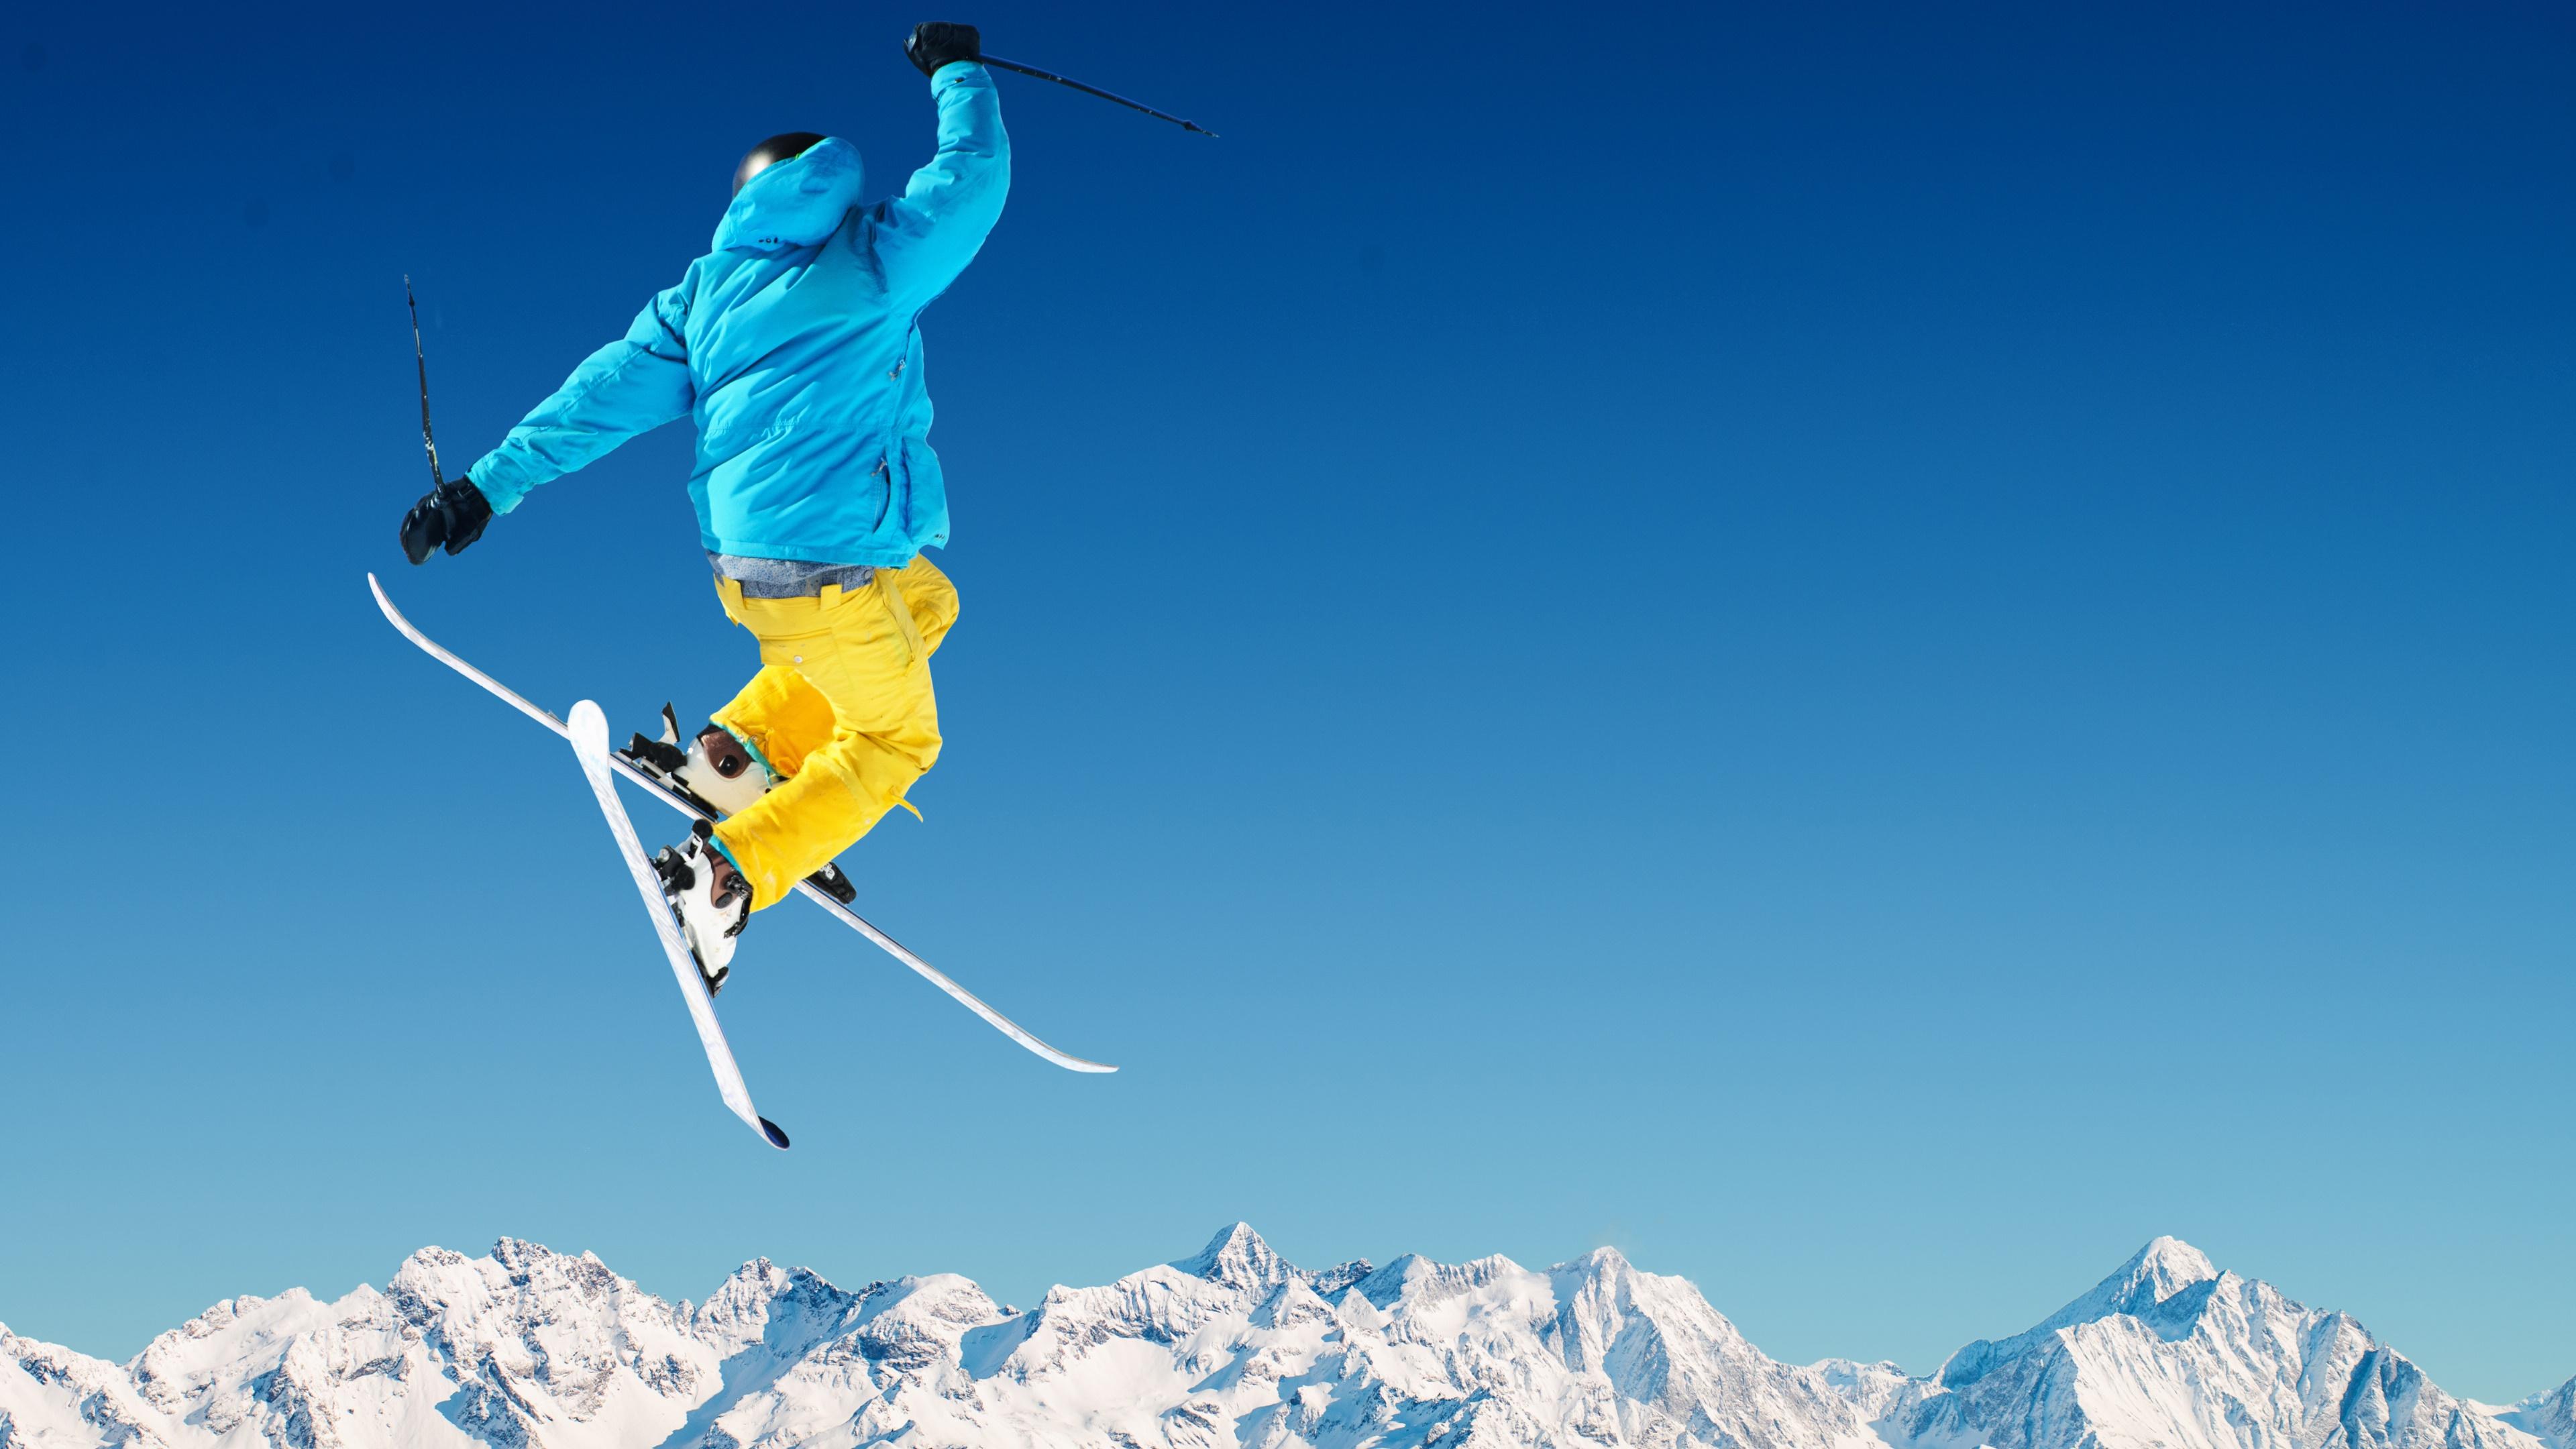 Freestyle skiing wallpaper